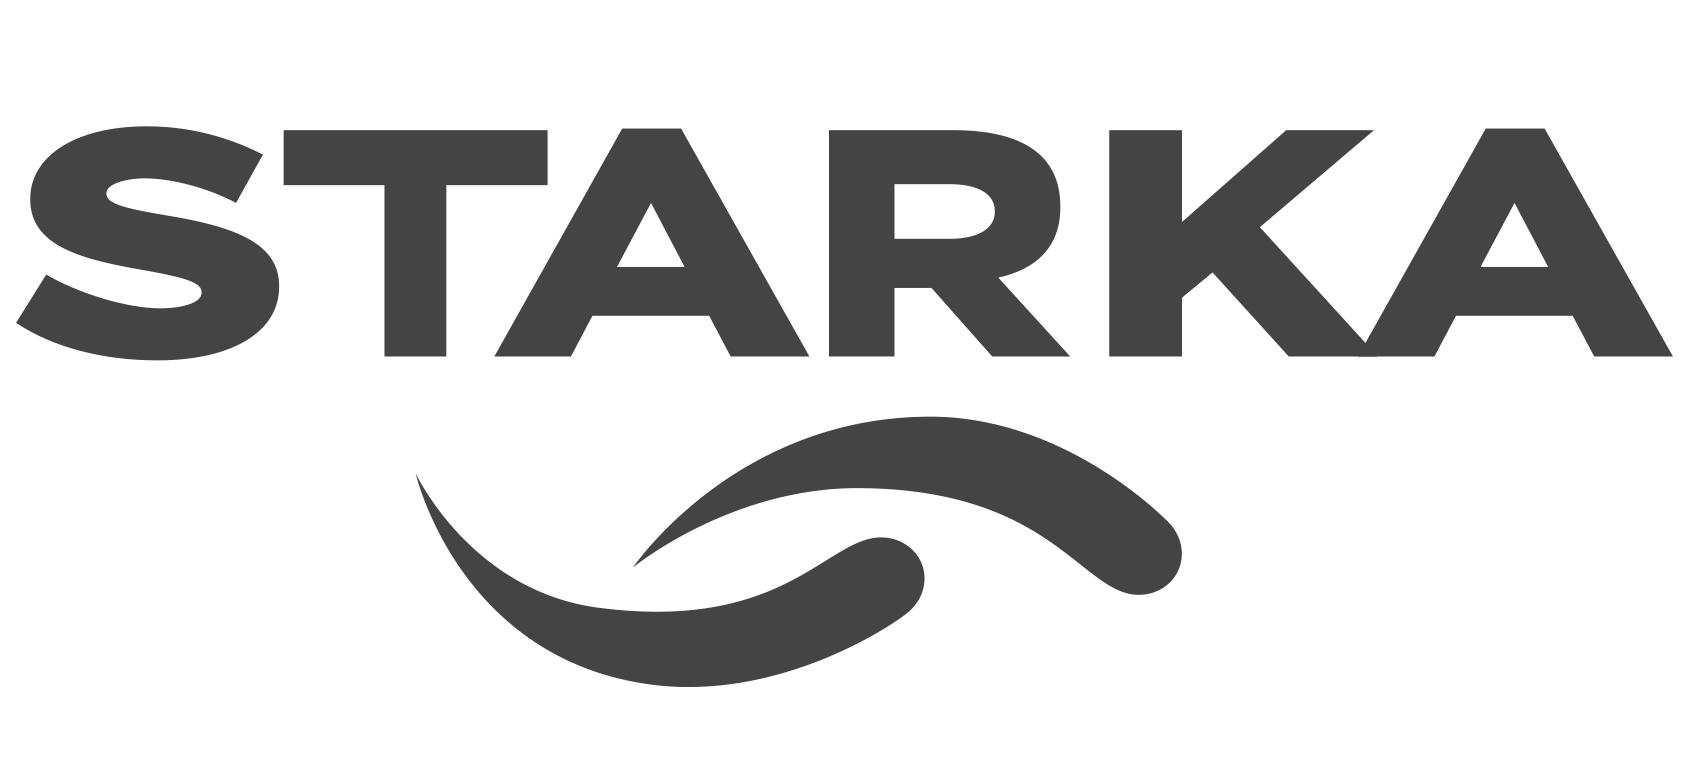 utst19-stillhet-starka-logo.png